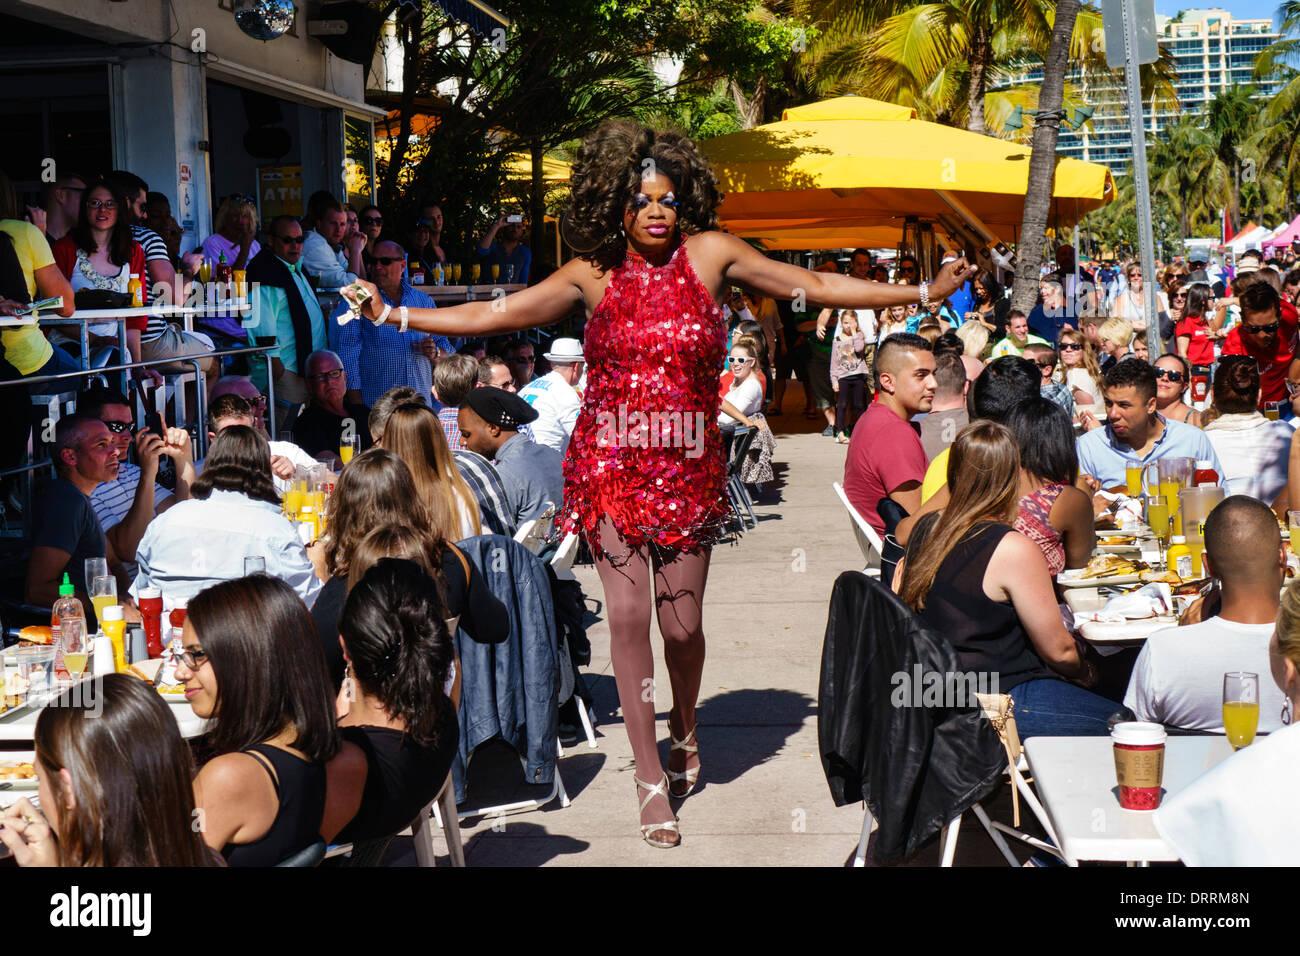 Miami Beach Florida Art Deco de Ocean Drive, la calle festival de fin de semana en el evento Feria Palace Bar restaurante Imagen De Stock